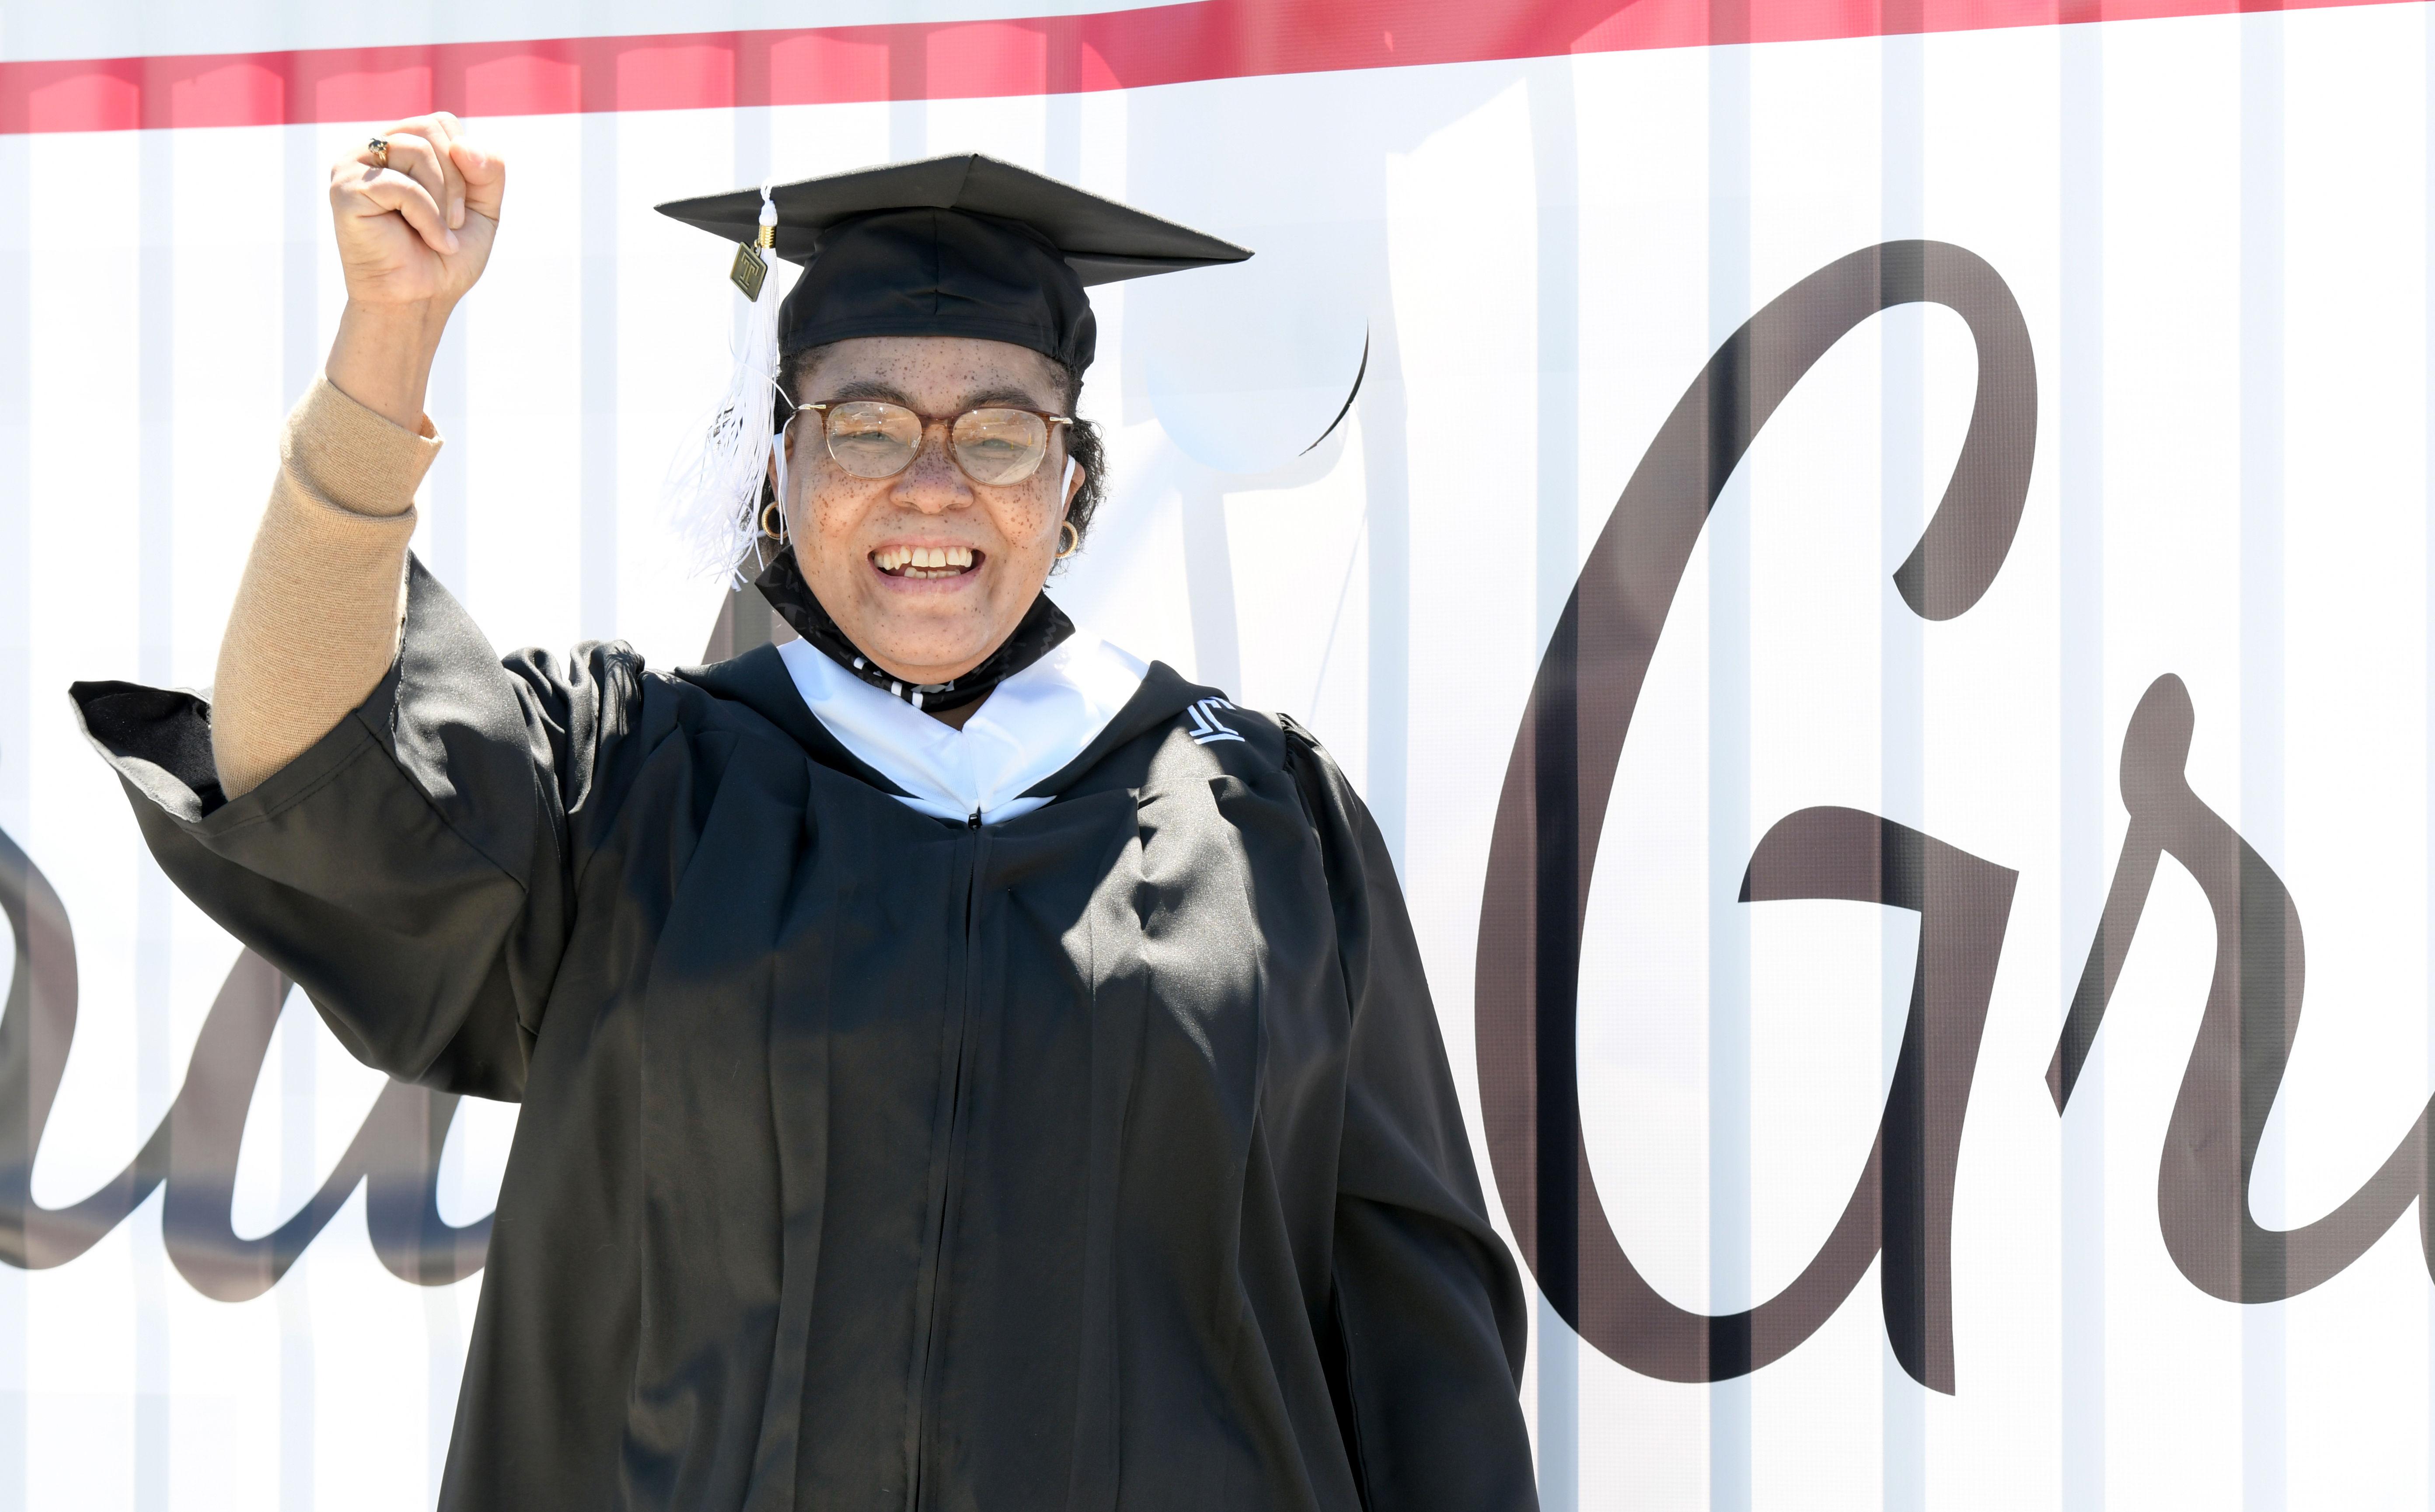 Graduate celebrates outside ceremony